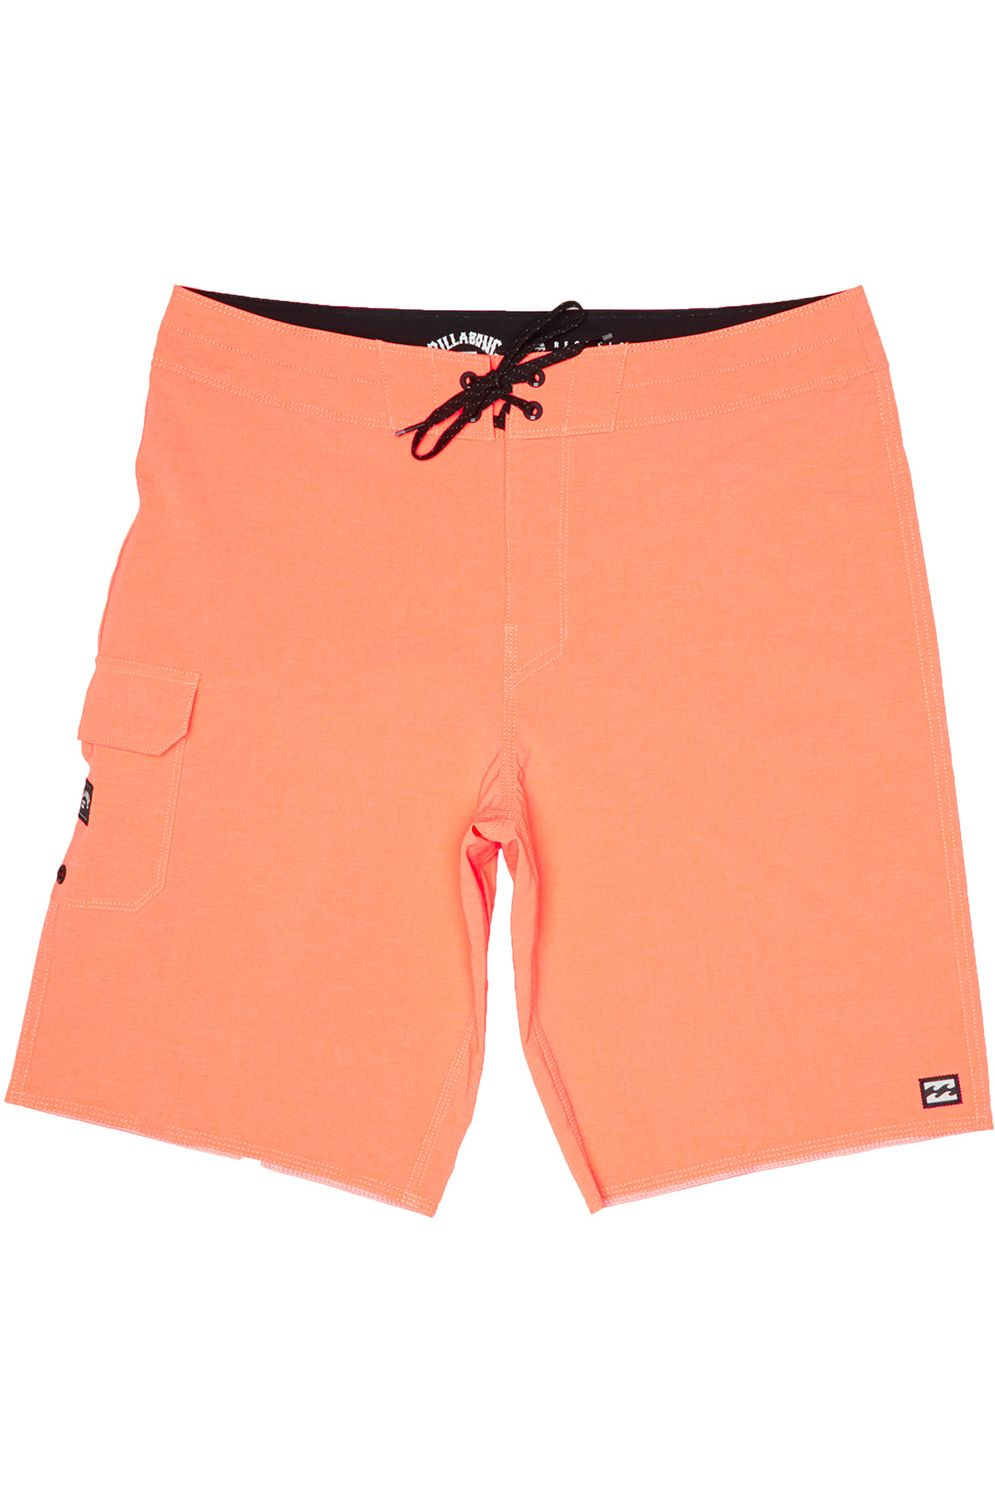 Billabong Boardshorts ALL DAY PRO Neo Orange